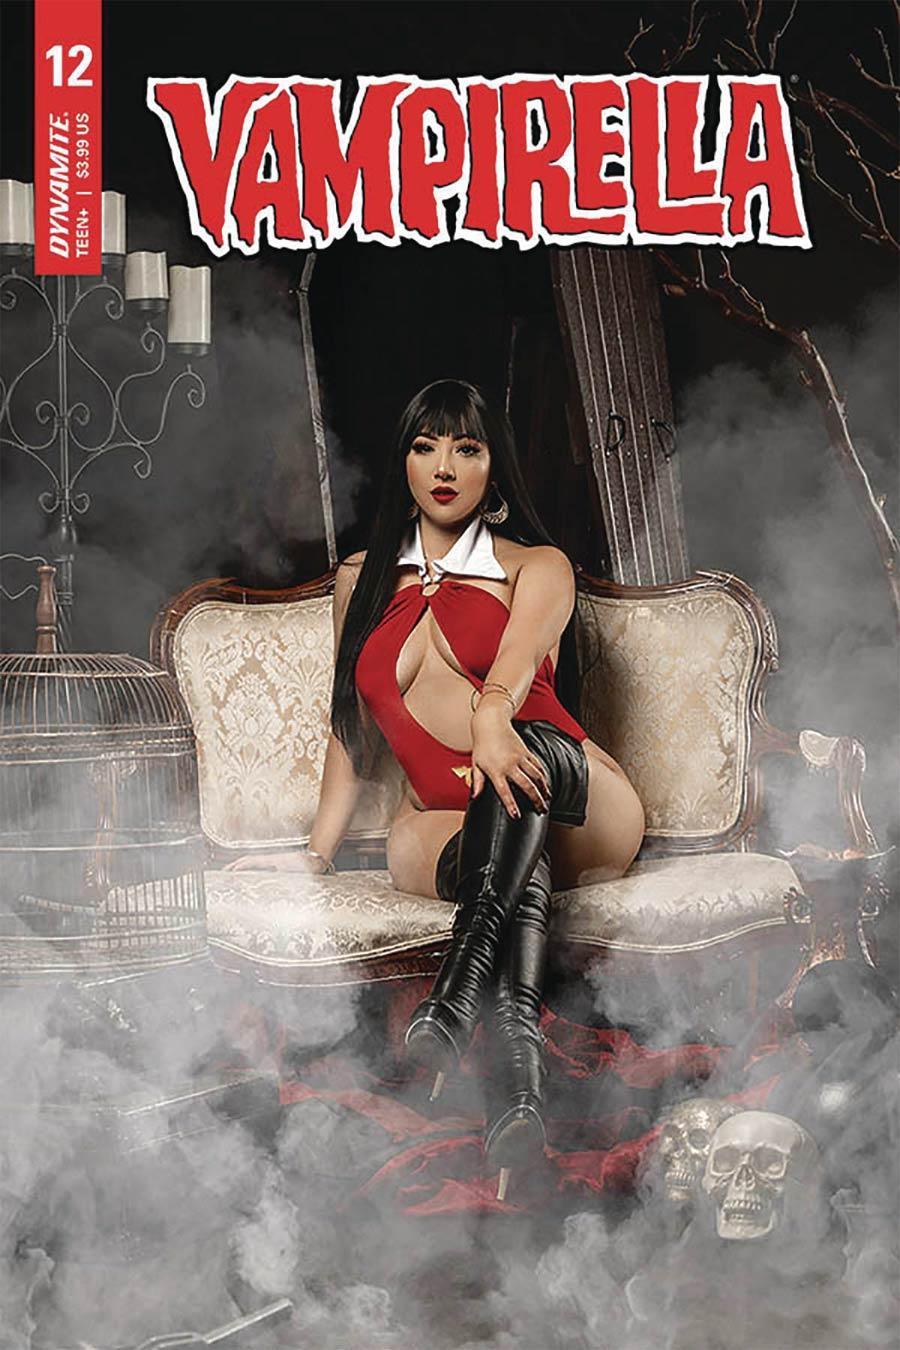 Vampirella Vol 8 #12 Cover E Variant Marissa Ramirez Cosplay Photo Cover